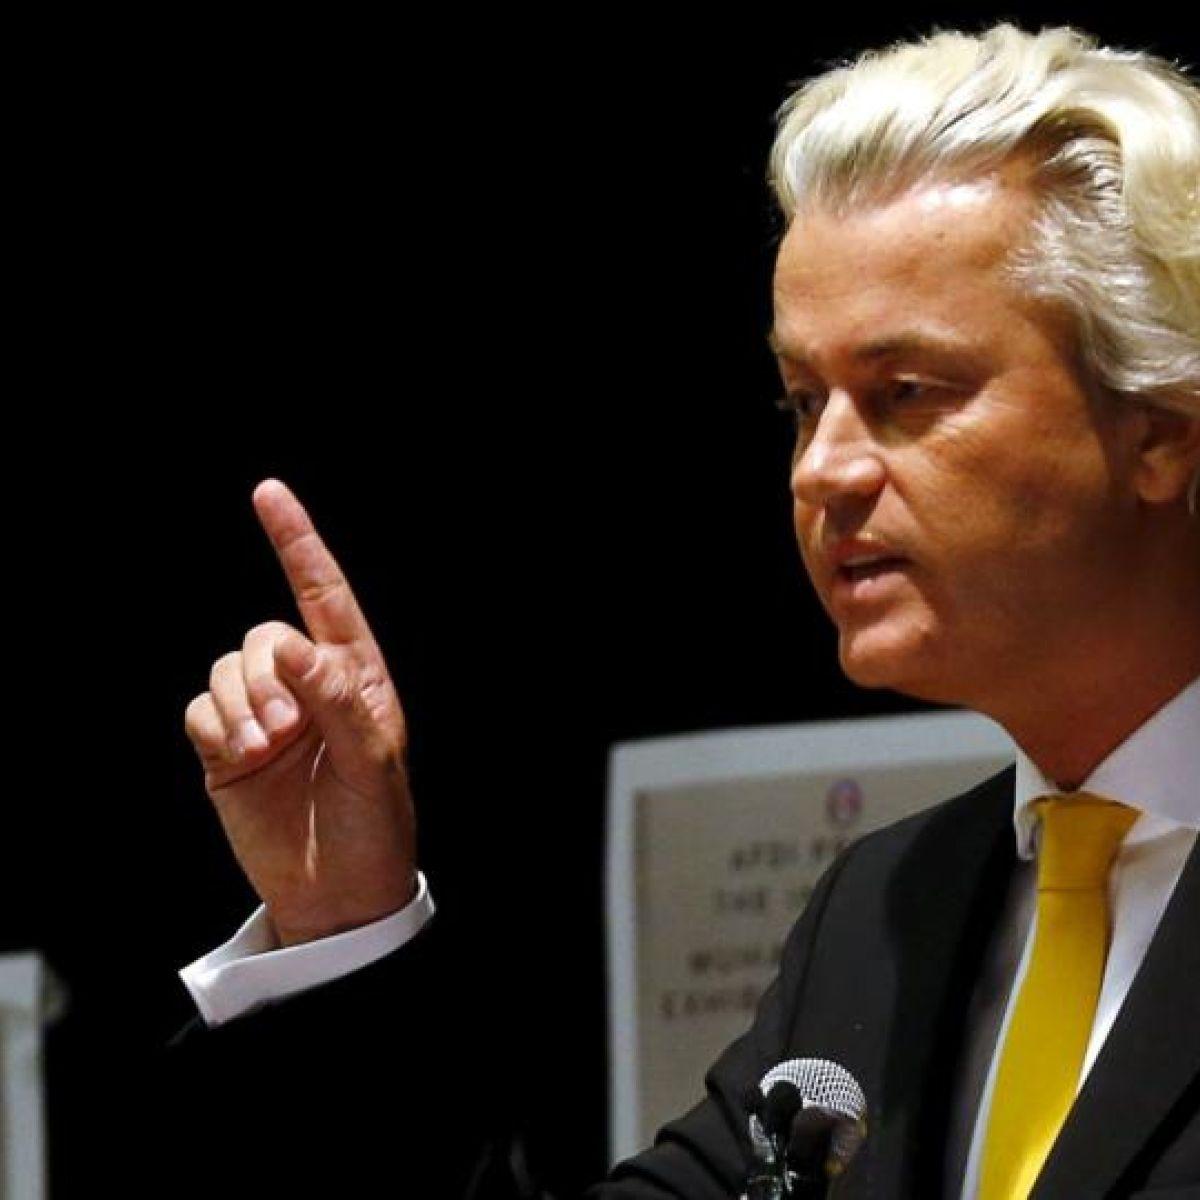 Dutch Deep Thinker Says Like Minded Elites Must Oppose